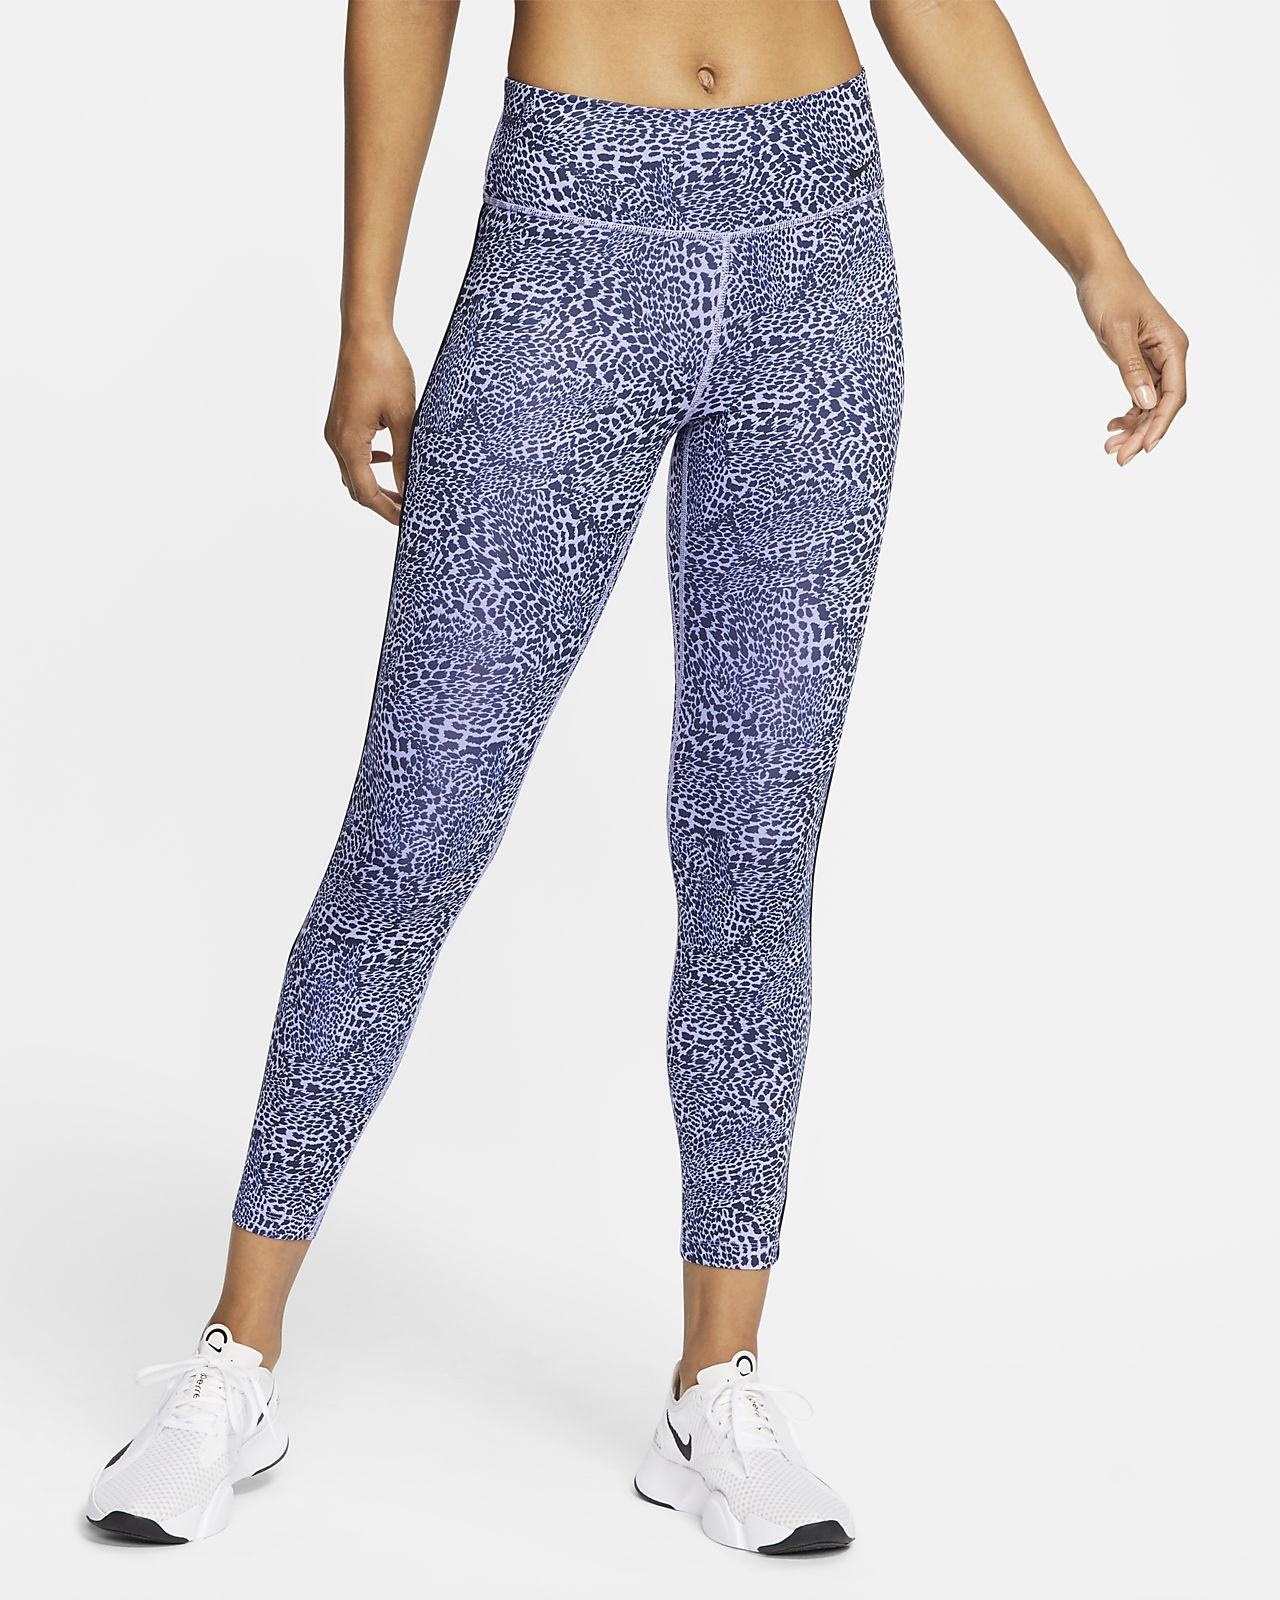 Leopard Mid-Rise 7/8 Leggings. Nike SK